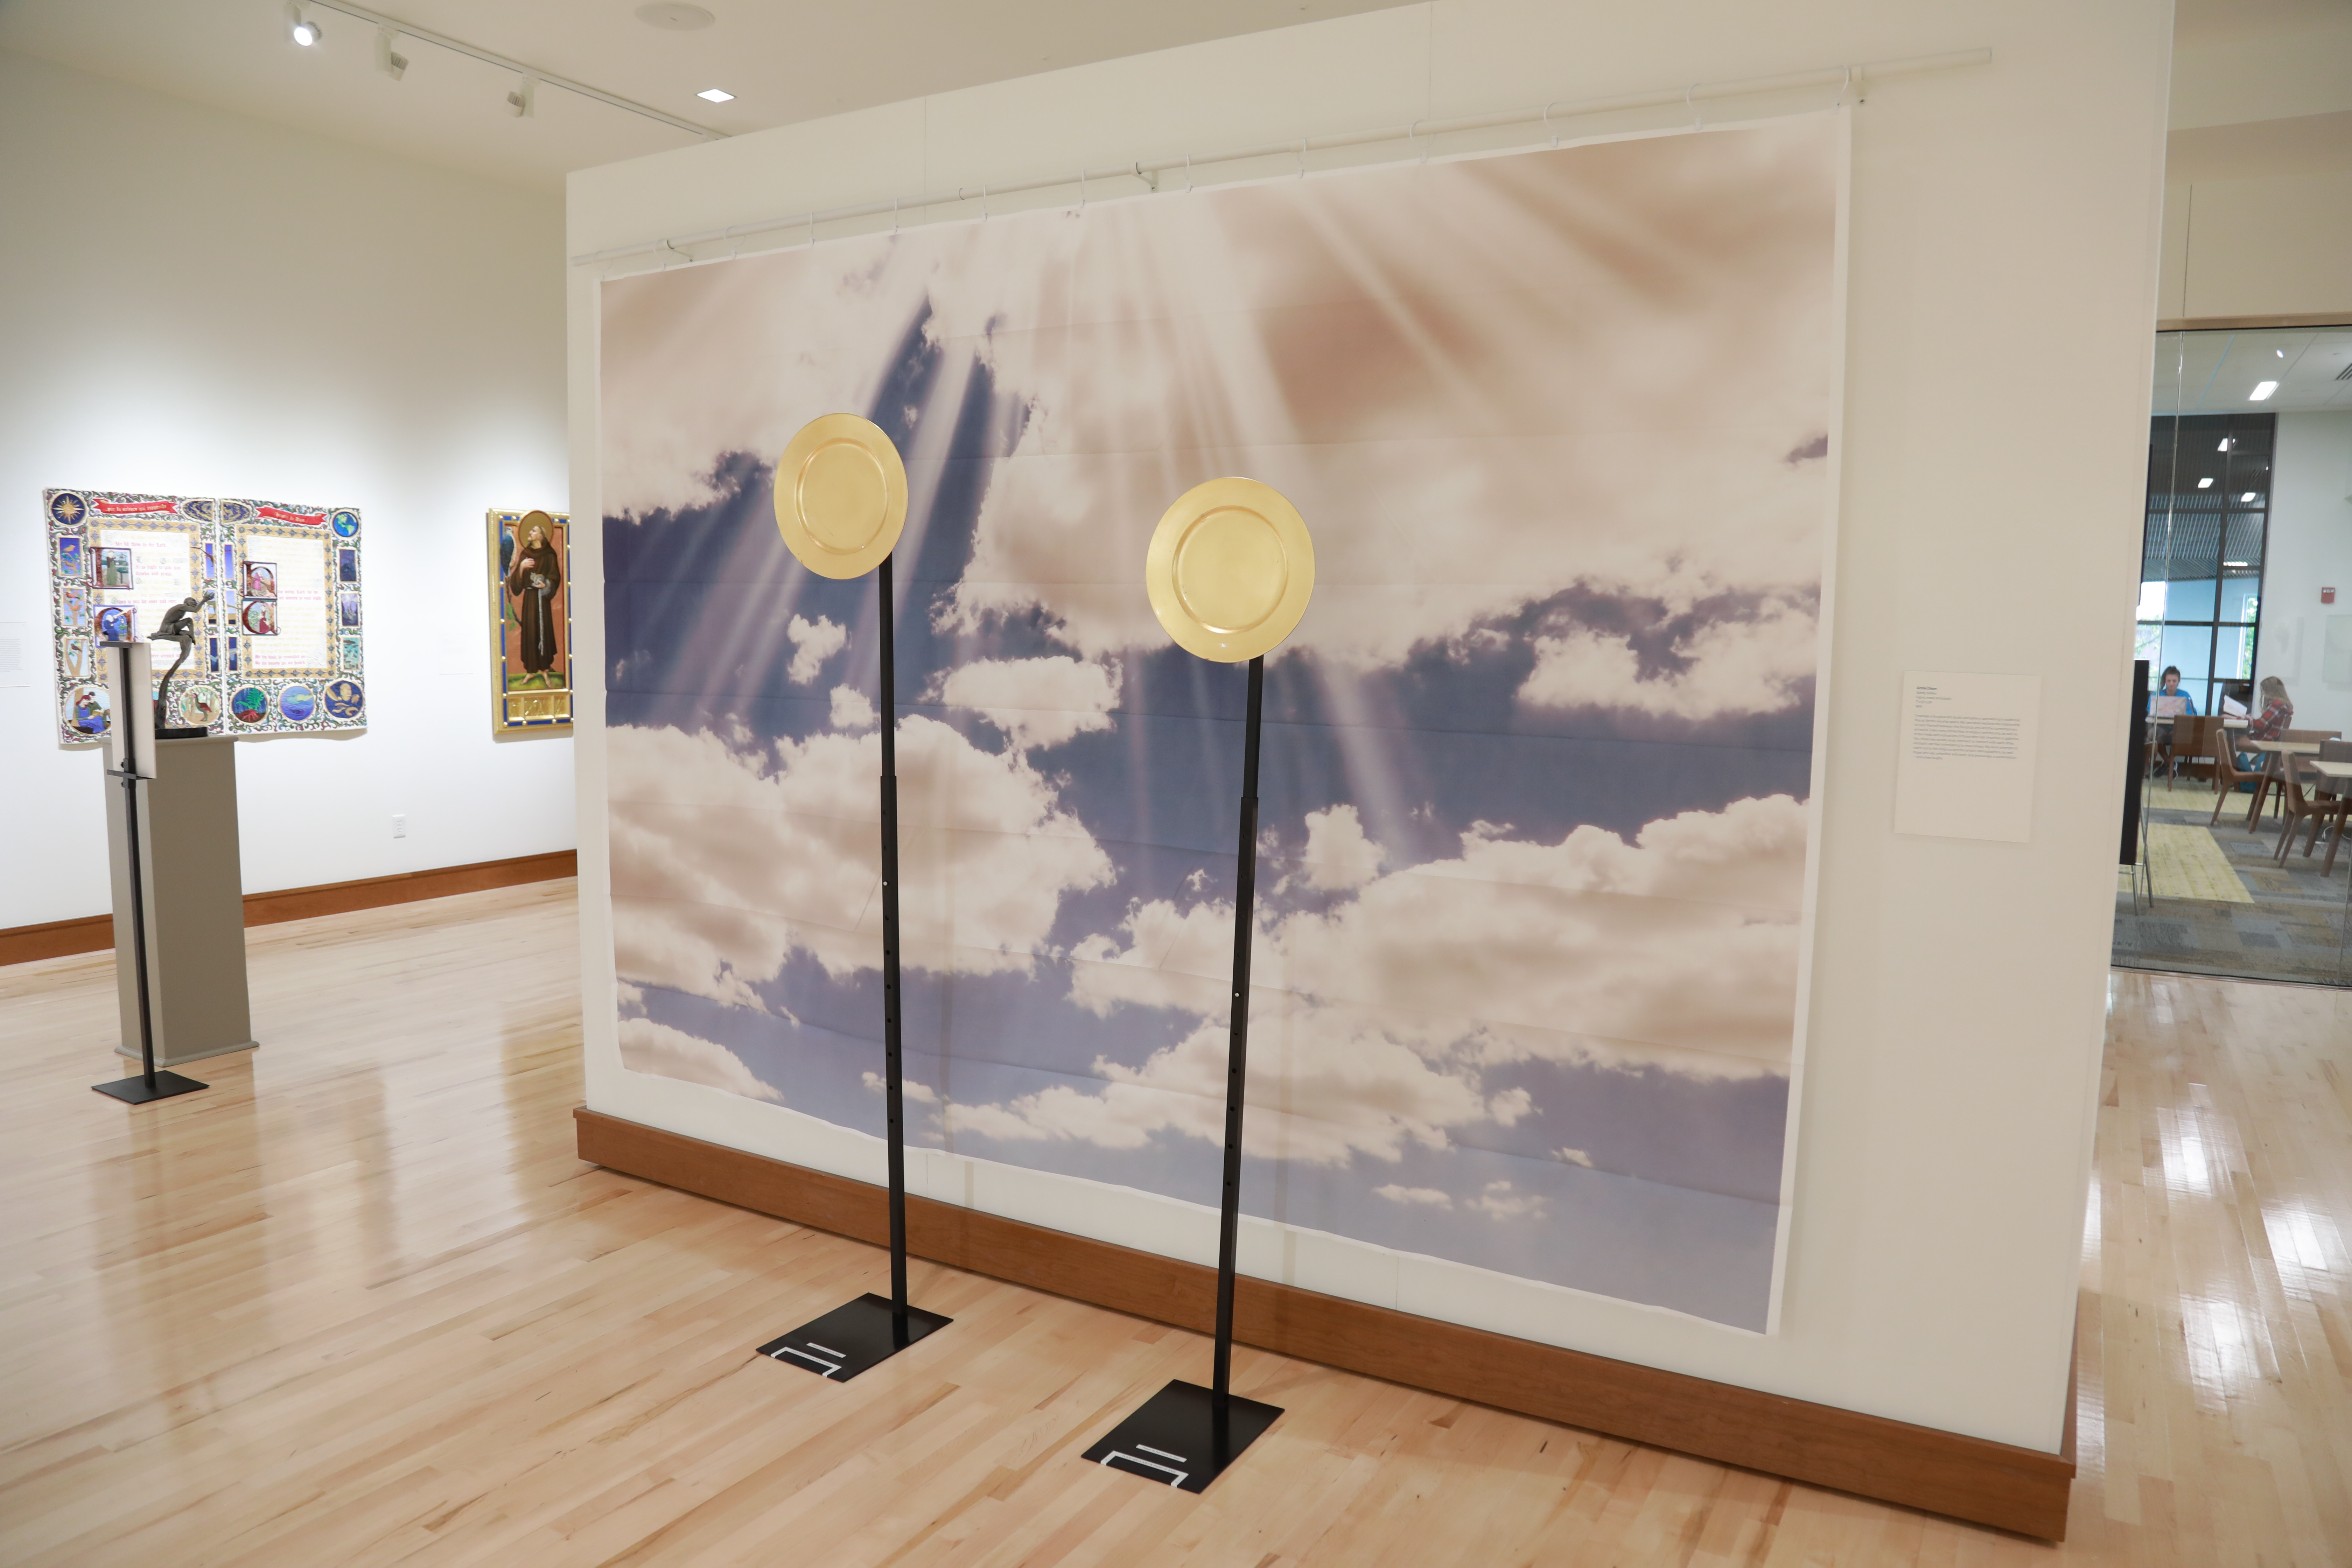 8th Catholic Arts Biennial